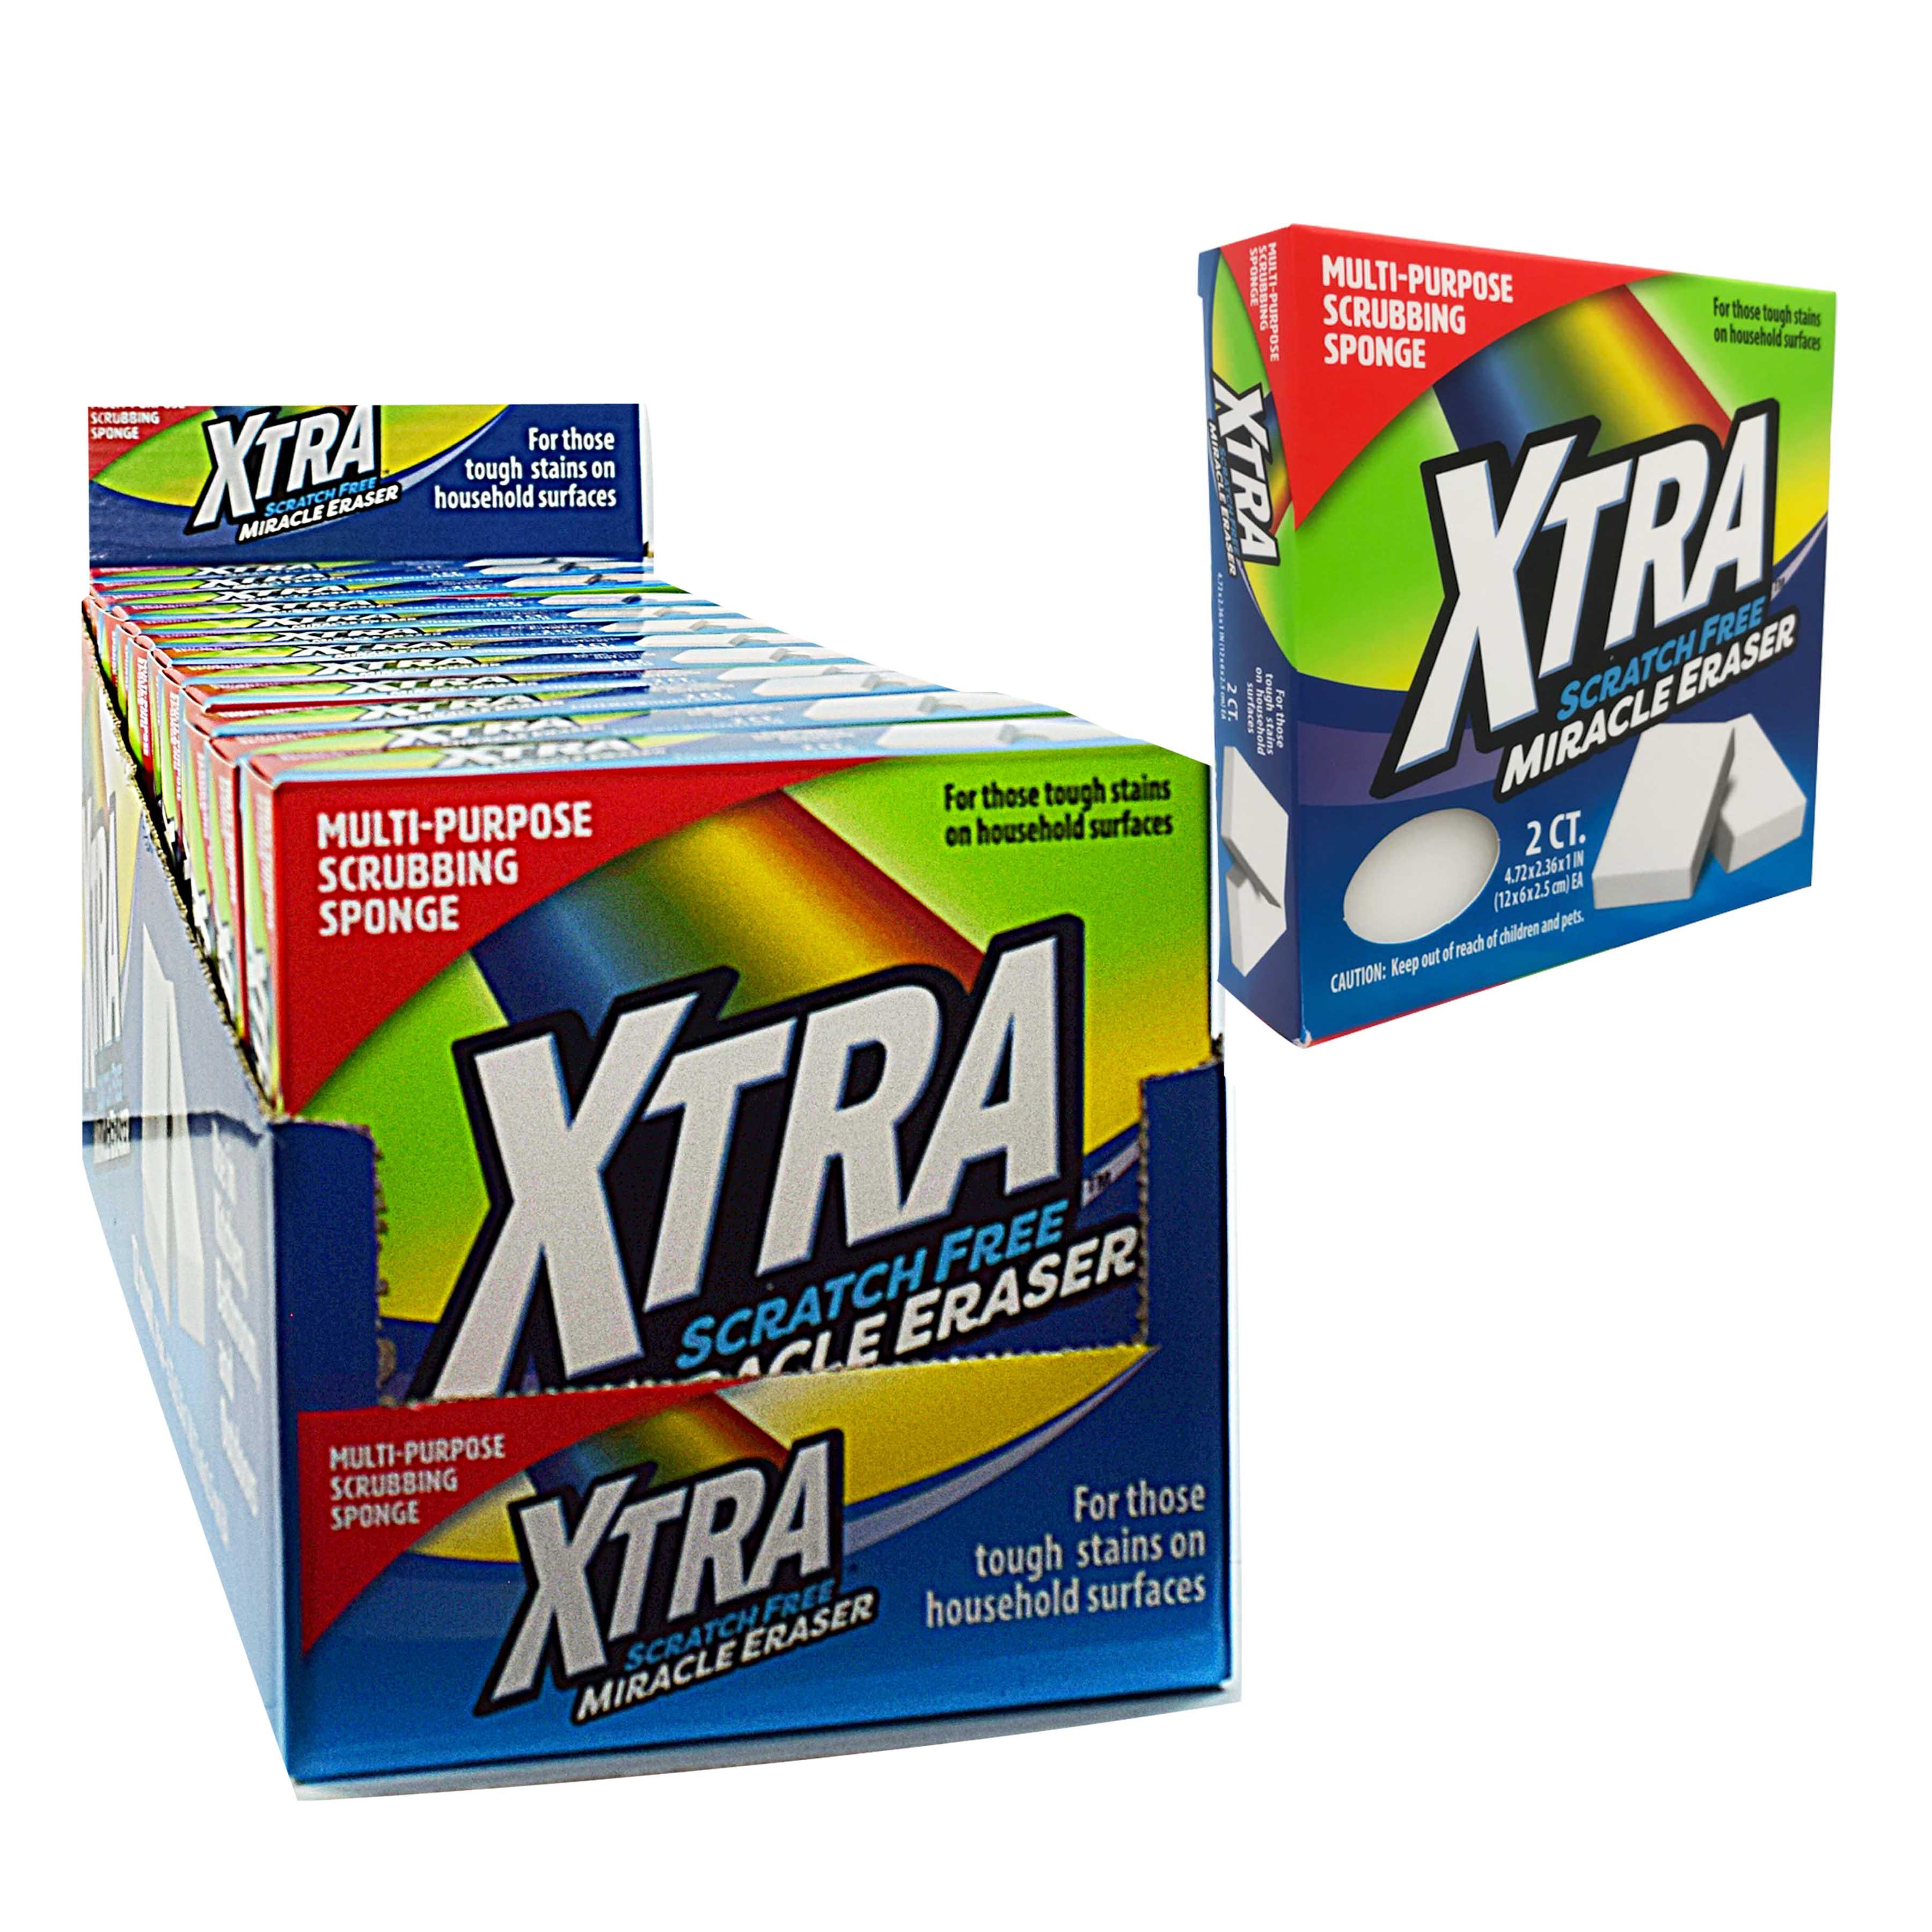 Xtra 2 ct. Miracle Eraser